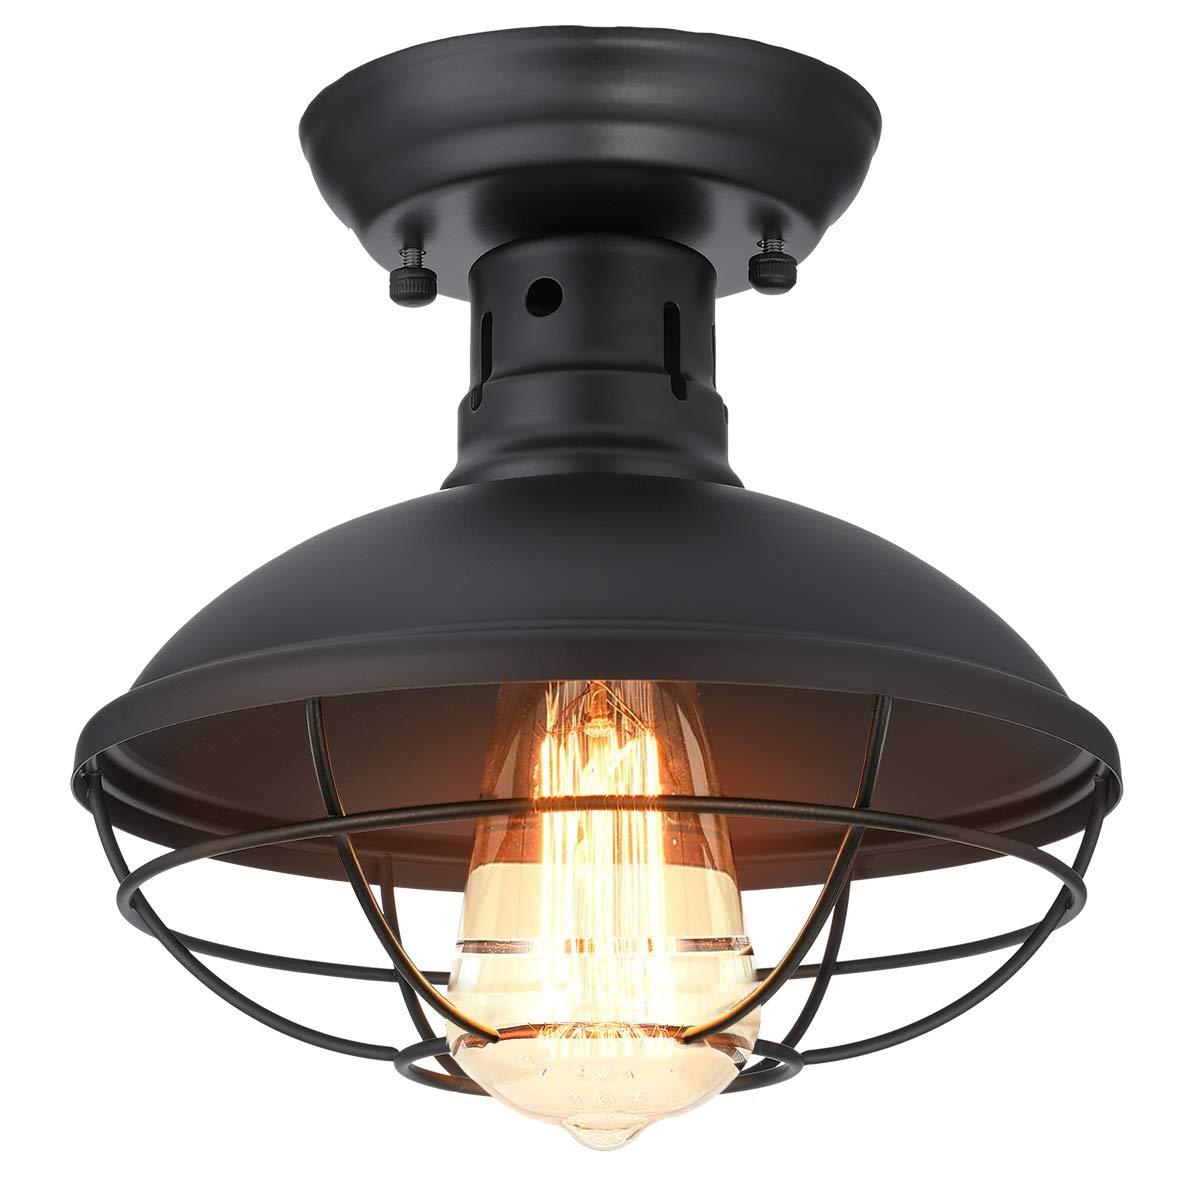 Kingso industrial metal cage ceiling light e26 rustic mini semi flush mounted pendant lighting dome bowl shaped lamp fixture farmhouse style for